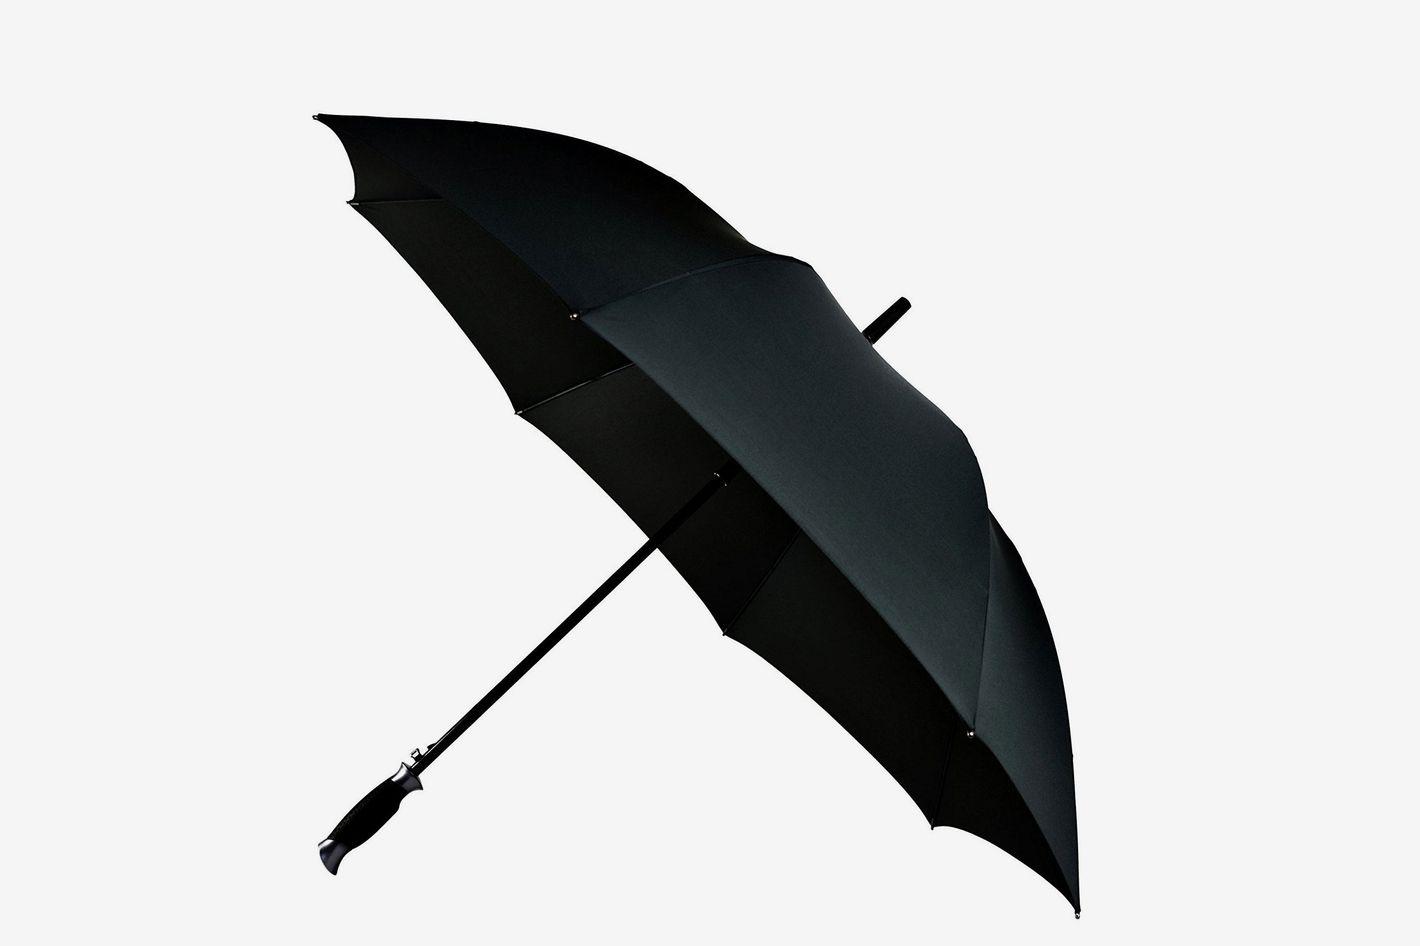 Best Umbrella For Strong Winds Lifetek New Yorker 54 Automatic Open Golf